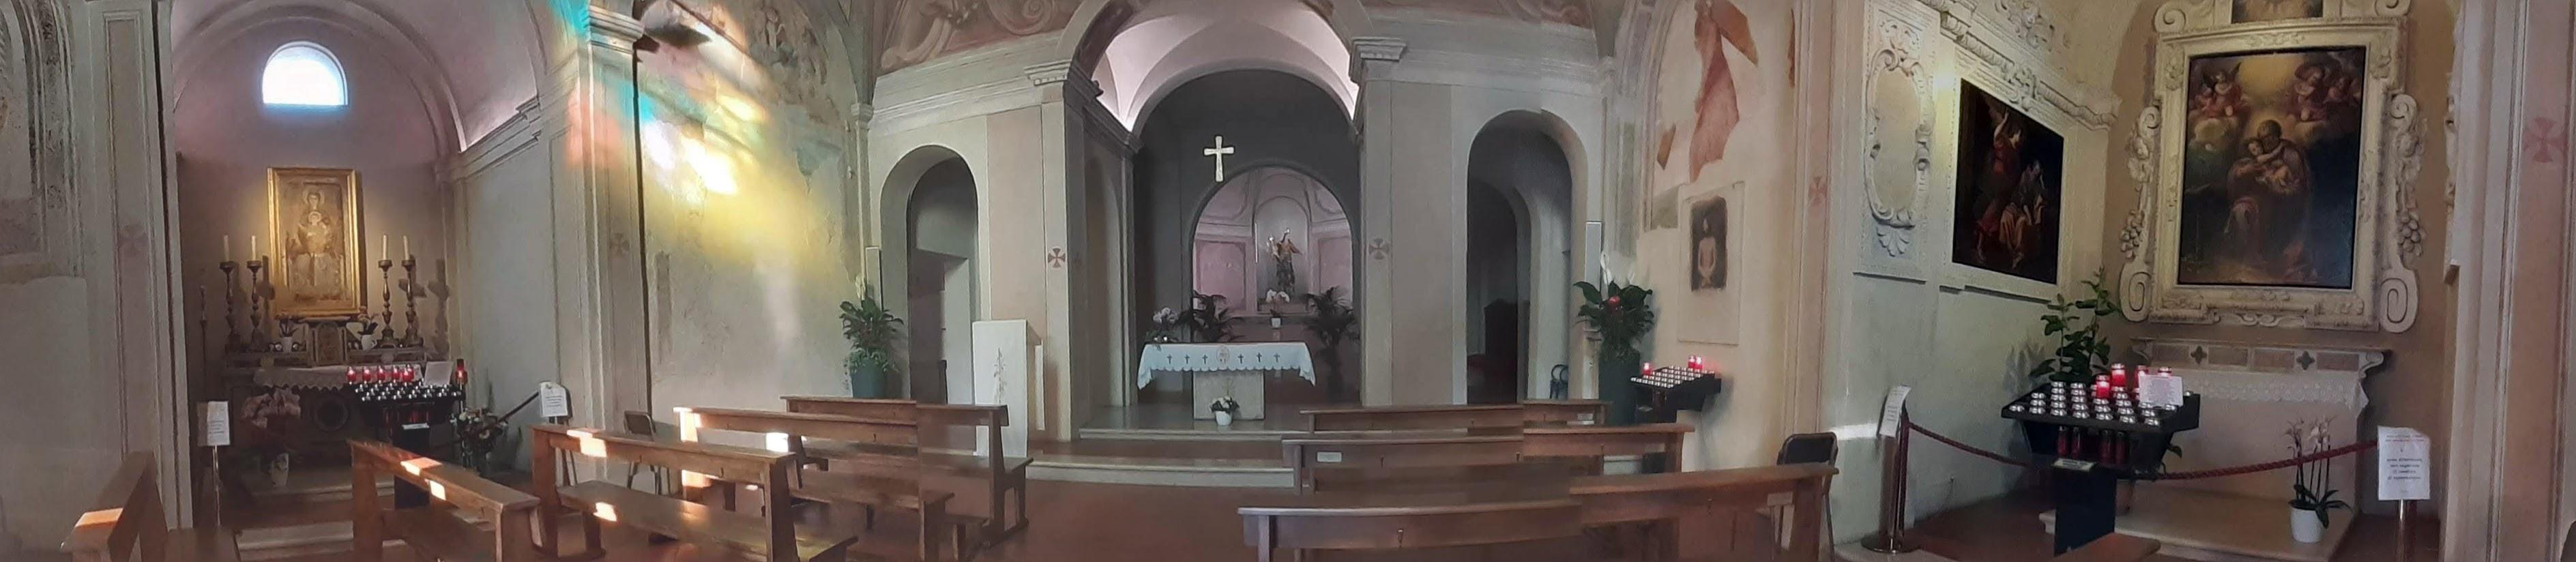 Santuario Ortica interno